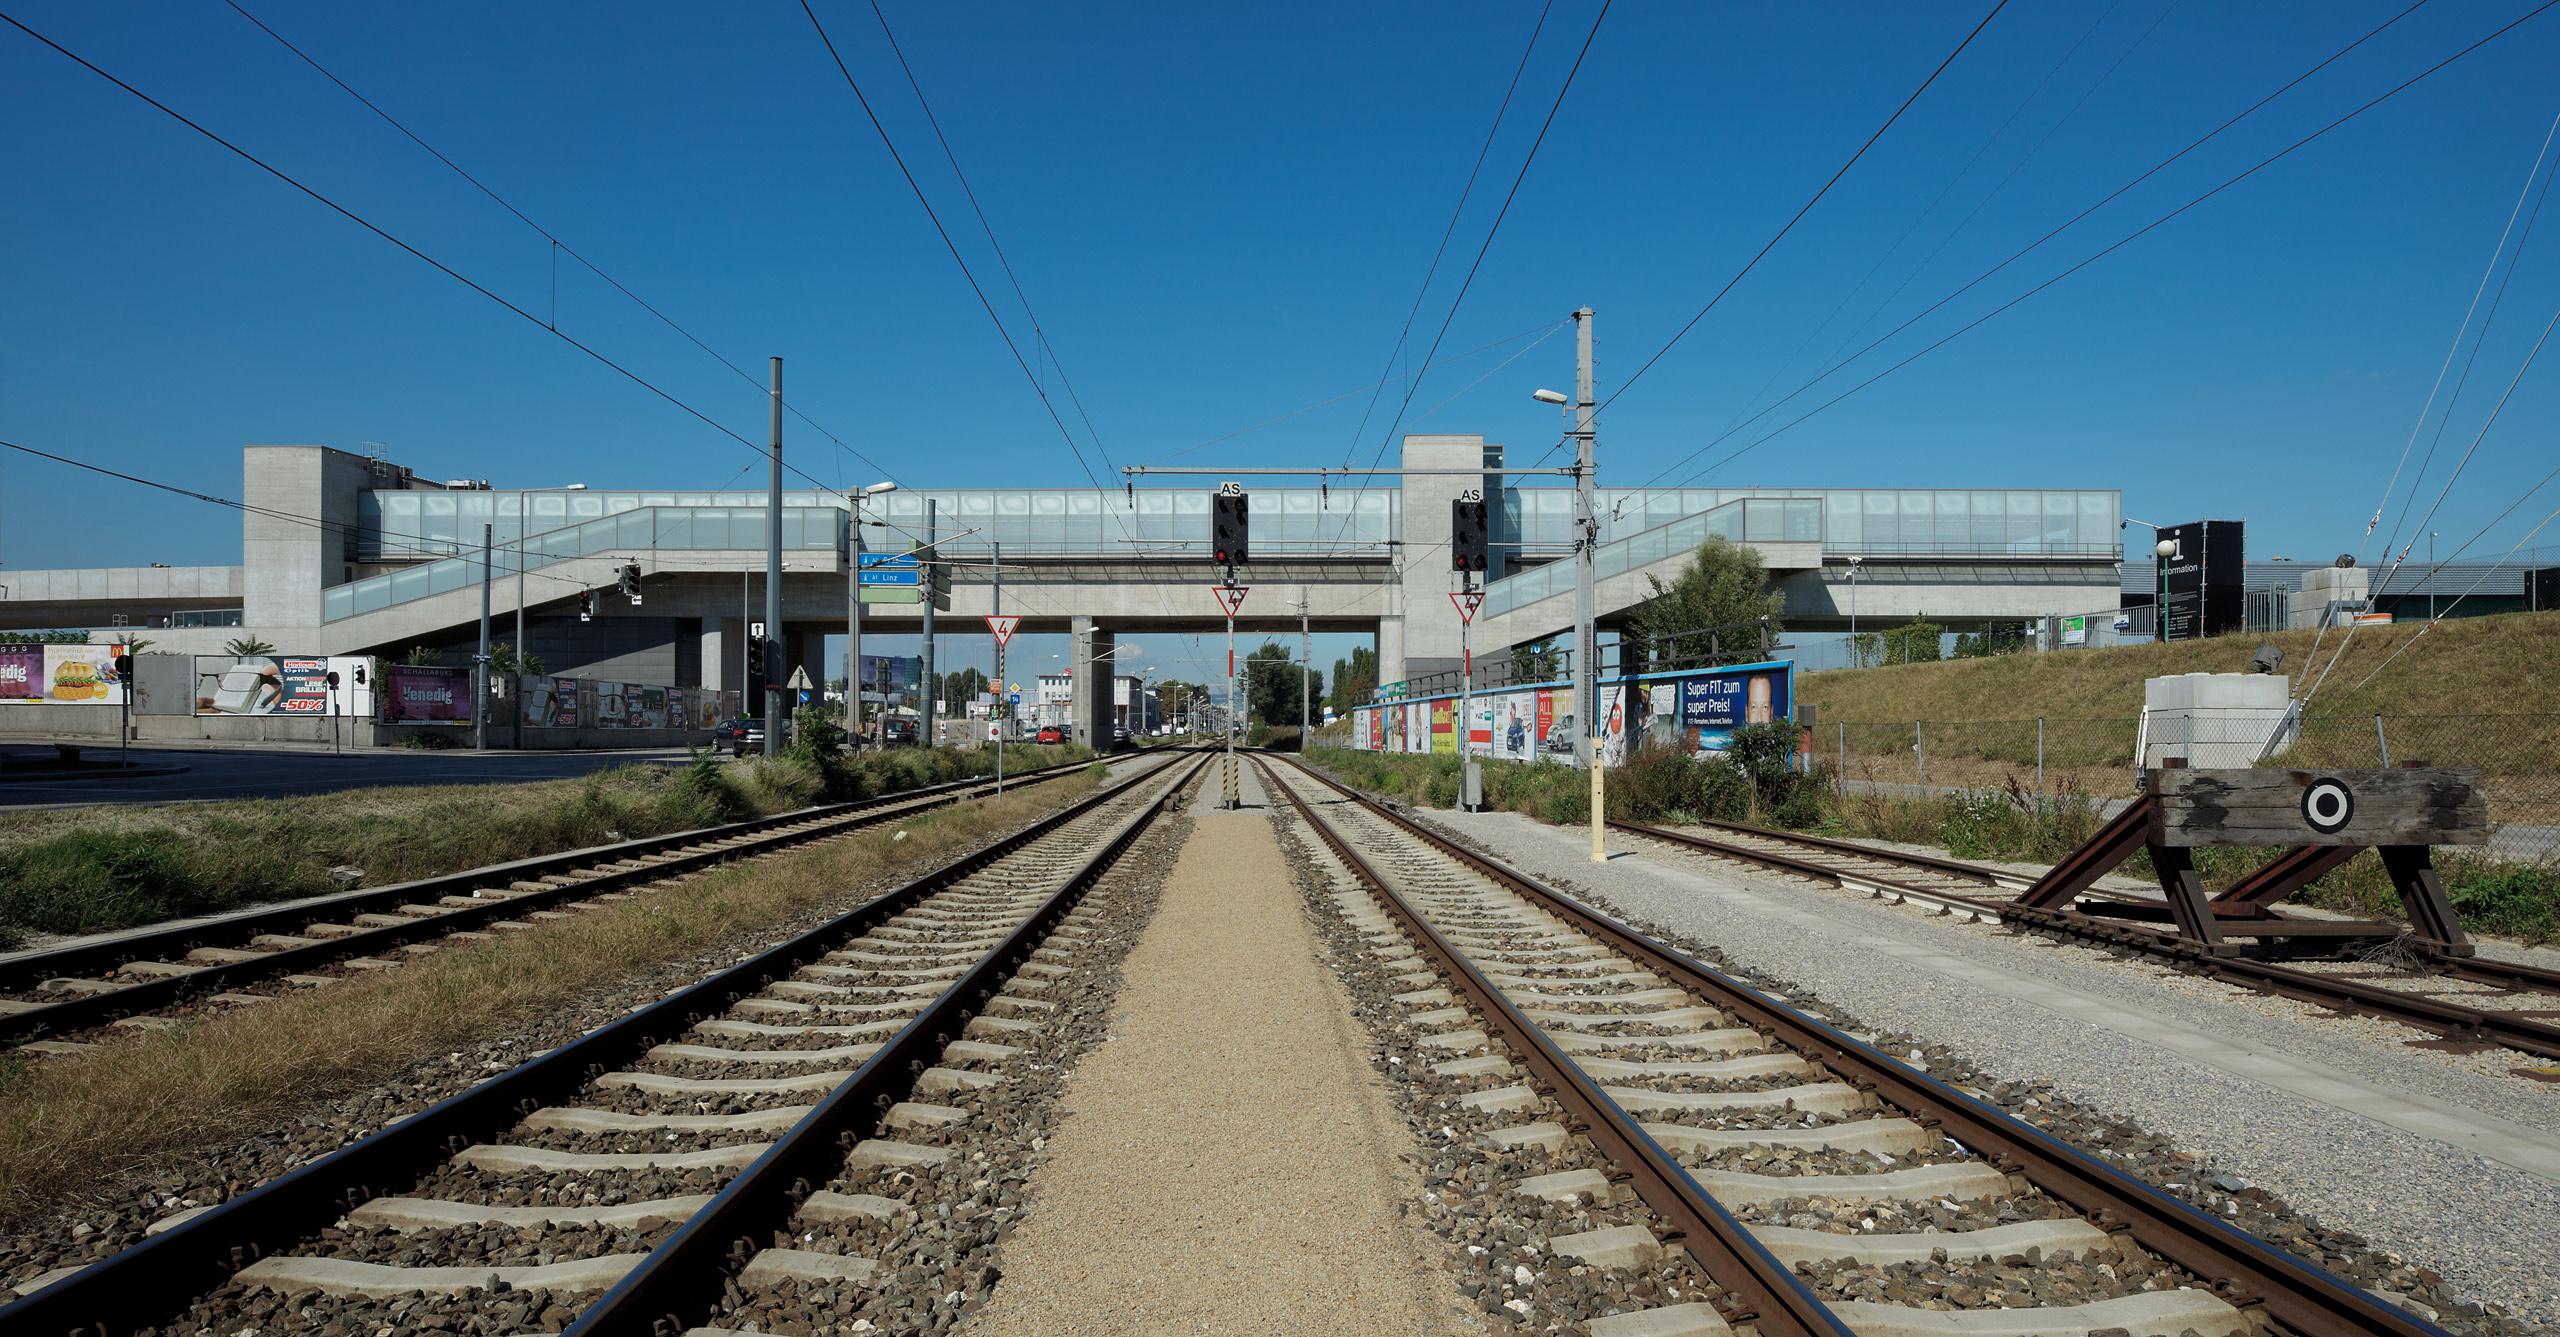 U2 Underground  Station Donaumarina